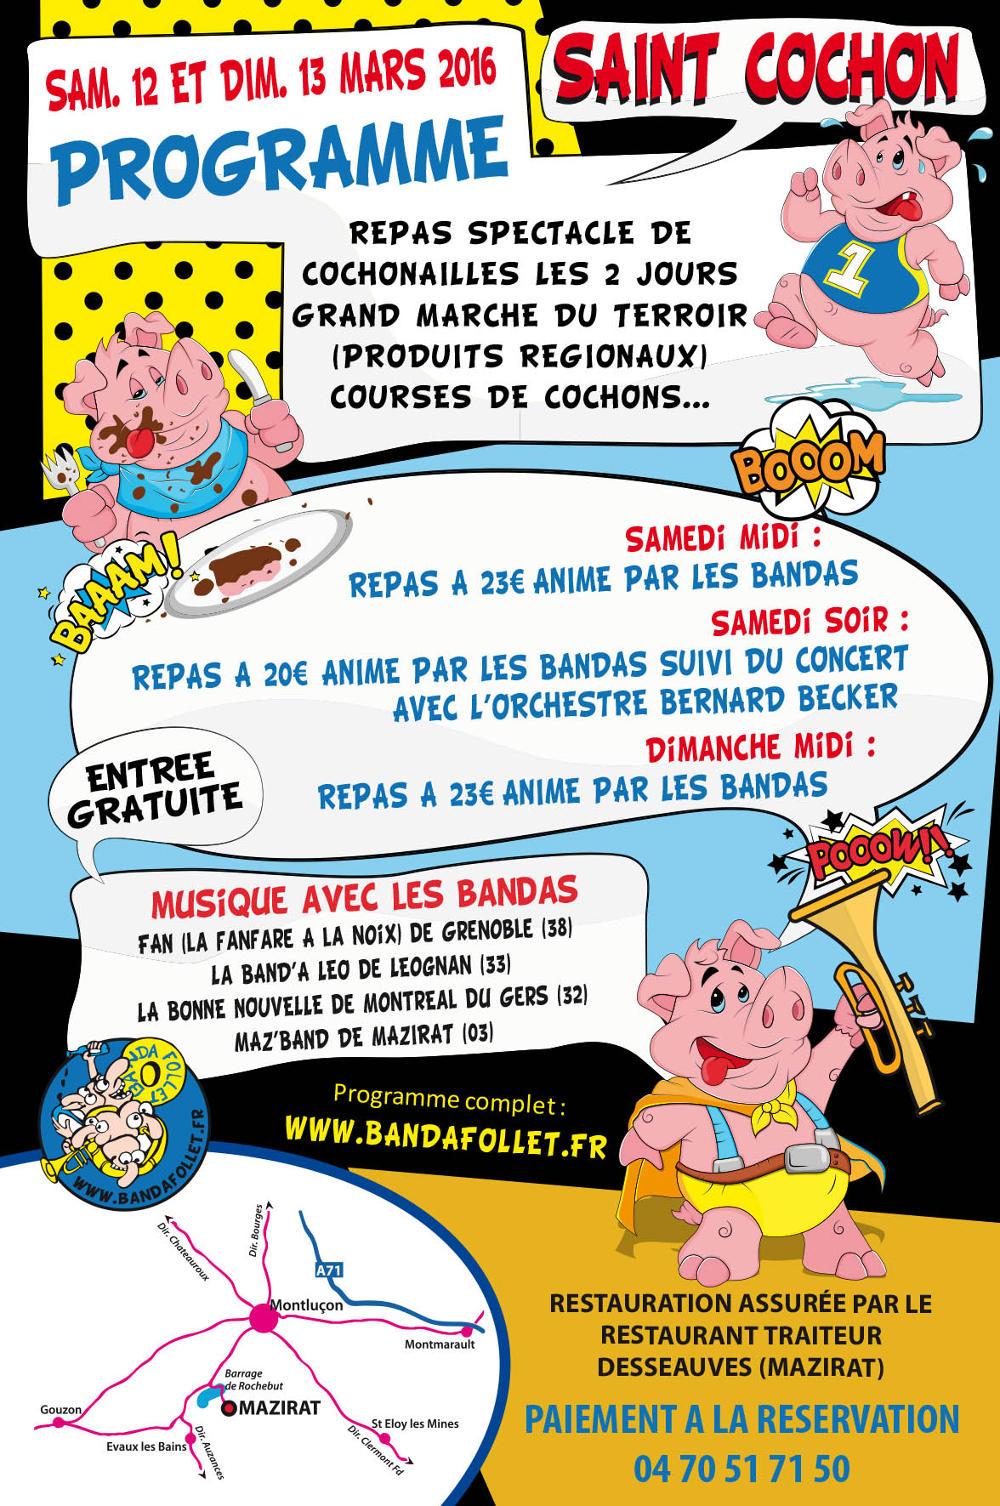 ST Cochon FLYER 2016 - A6 - VERSO